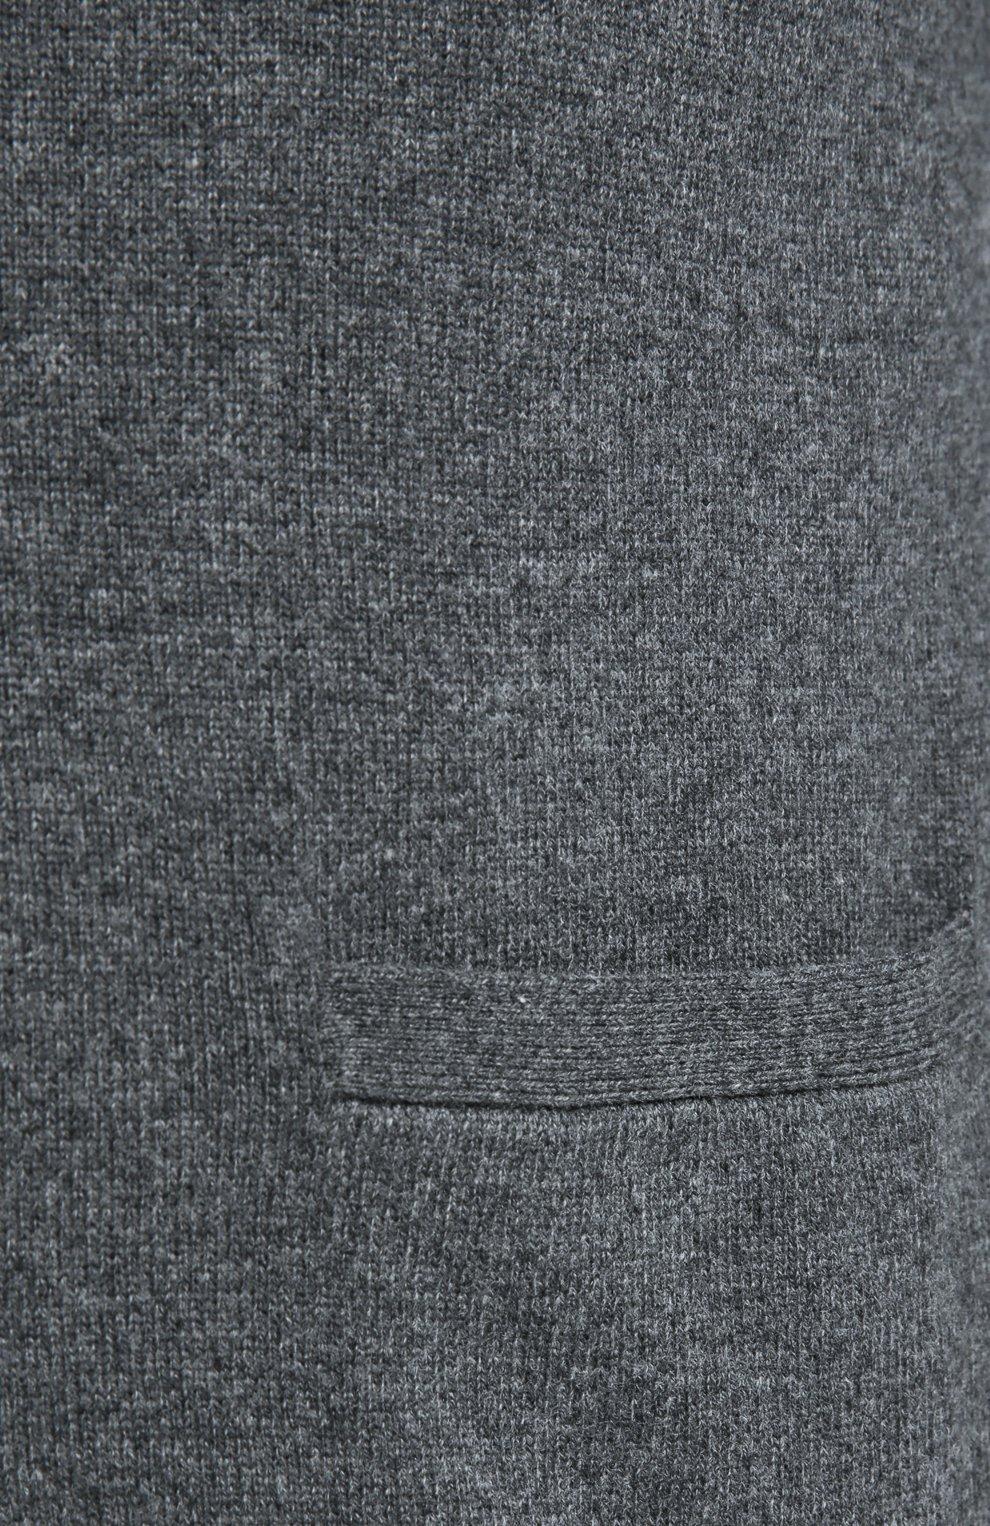 Шерстяной кардиган с карманами | Фото №5